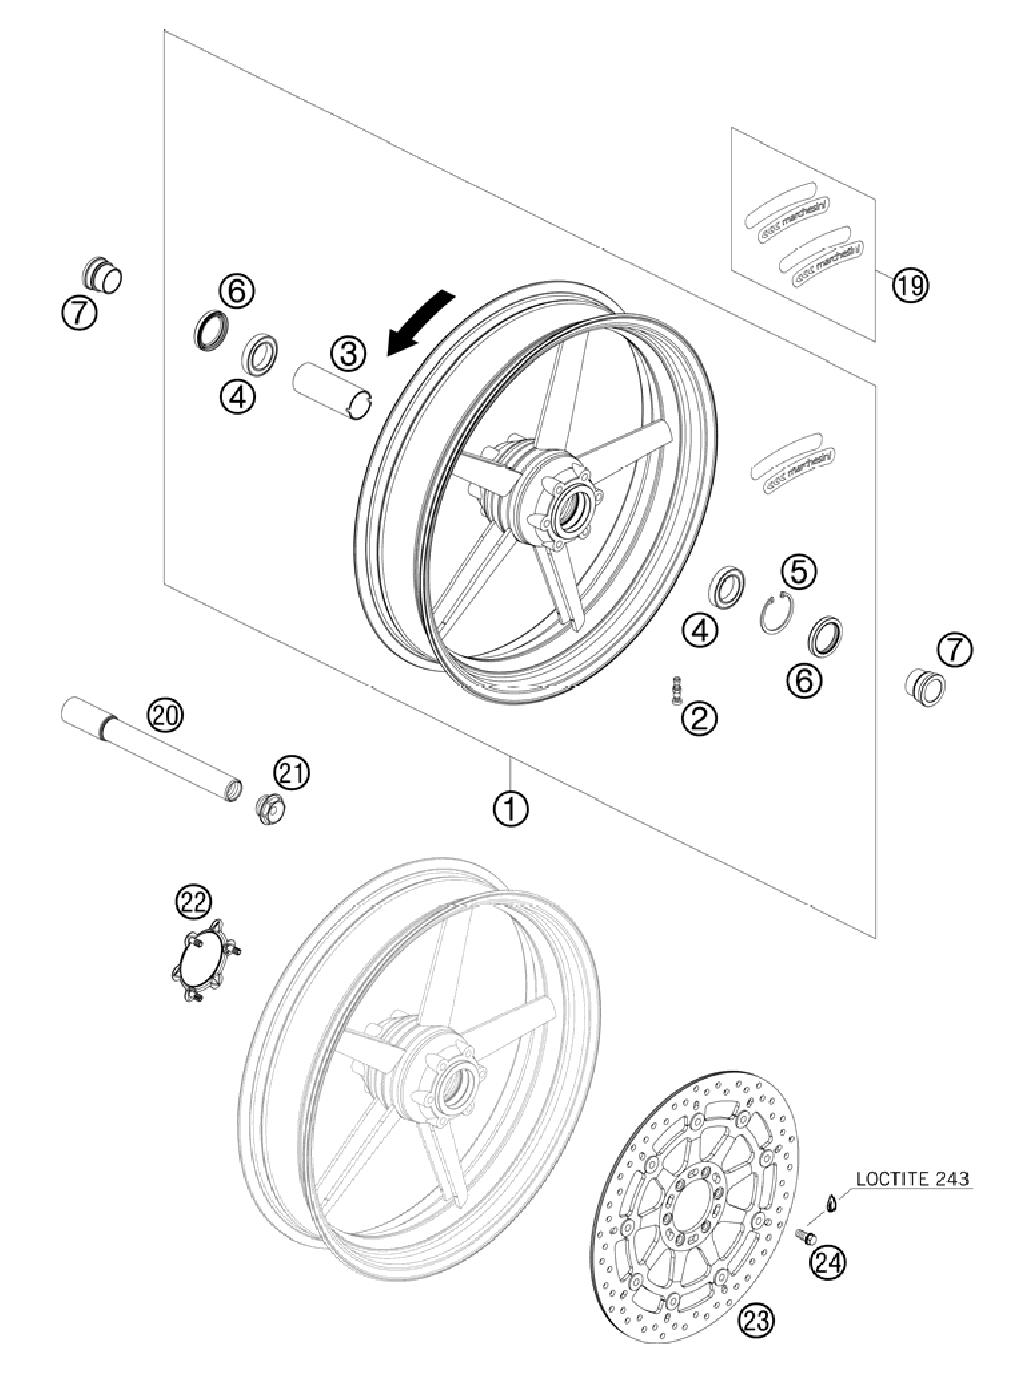 halo fog lights wiring diagram